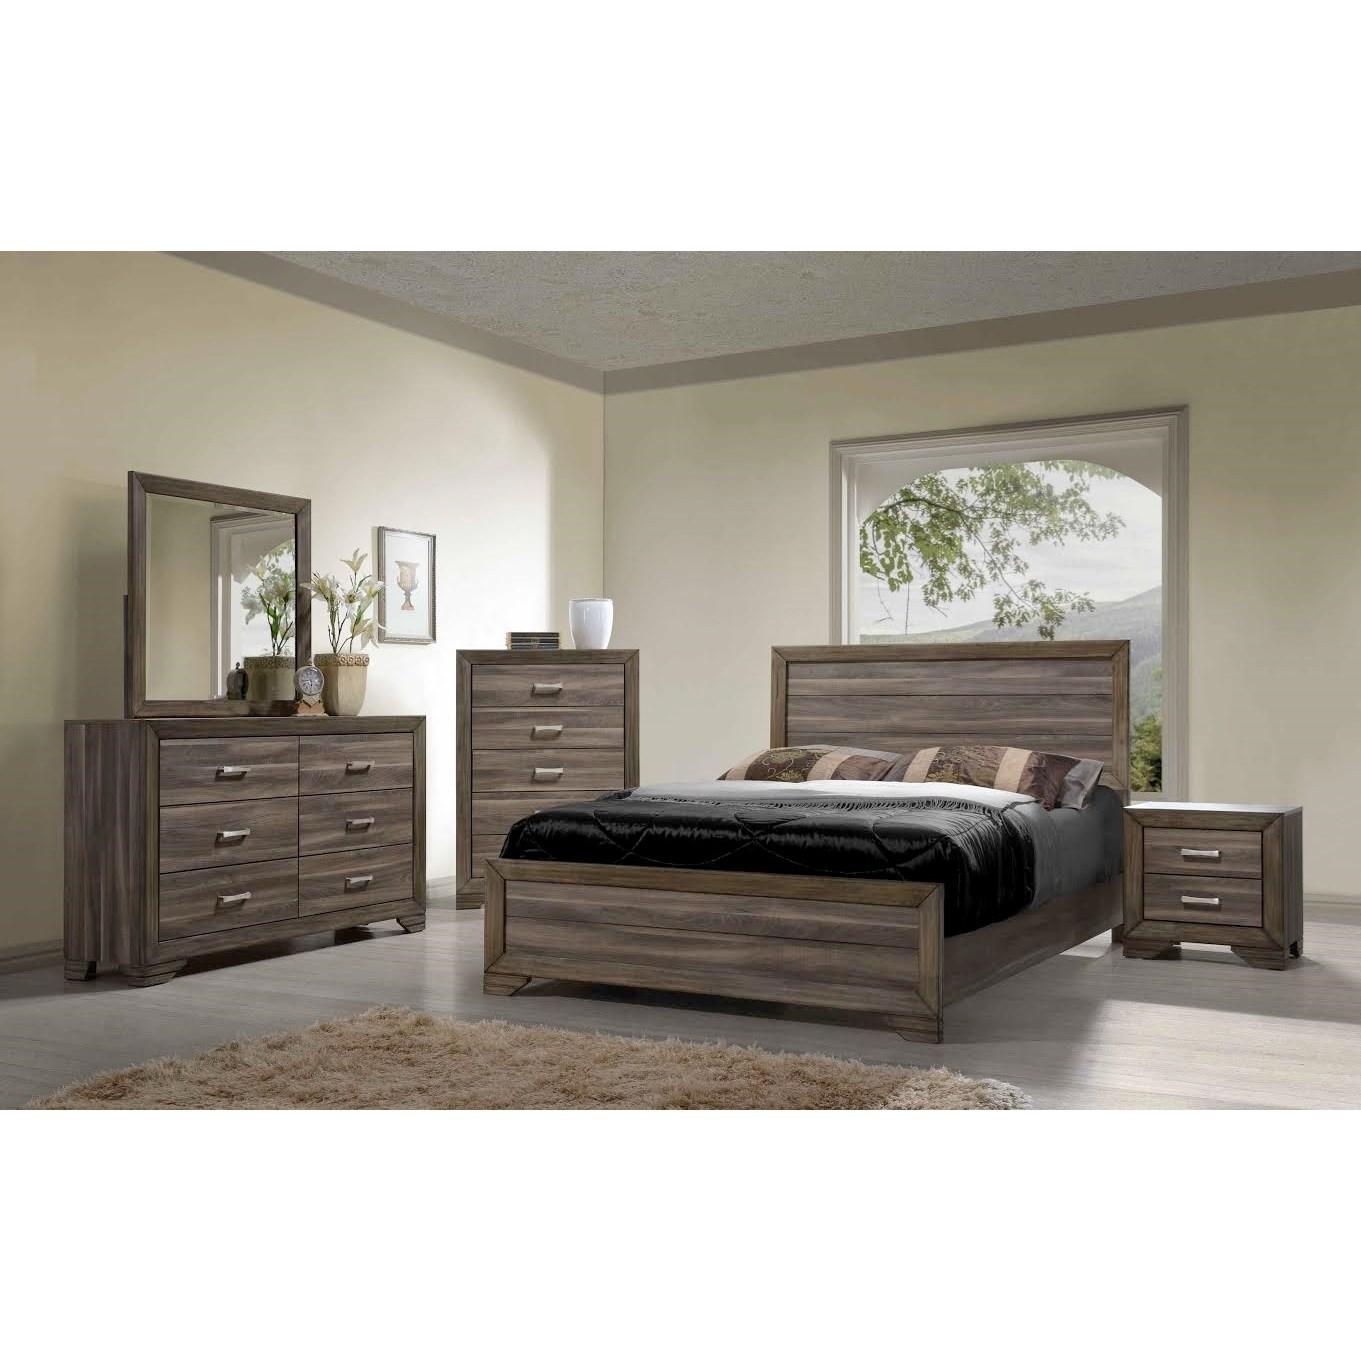 Wonderful Bernards Asheville Queen Bedroom Group